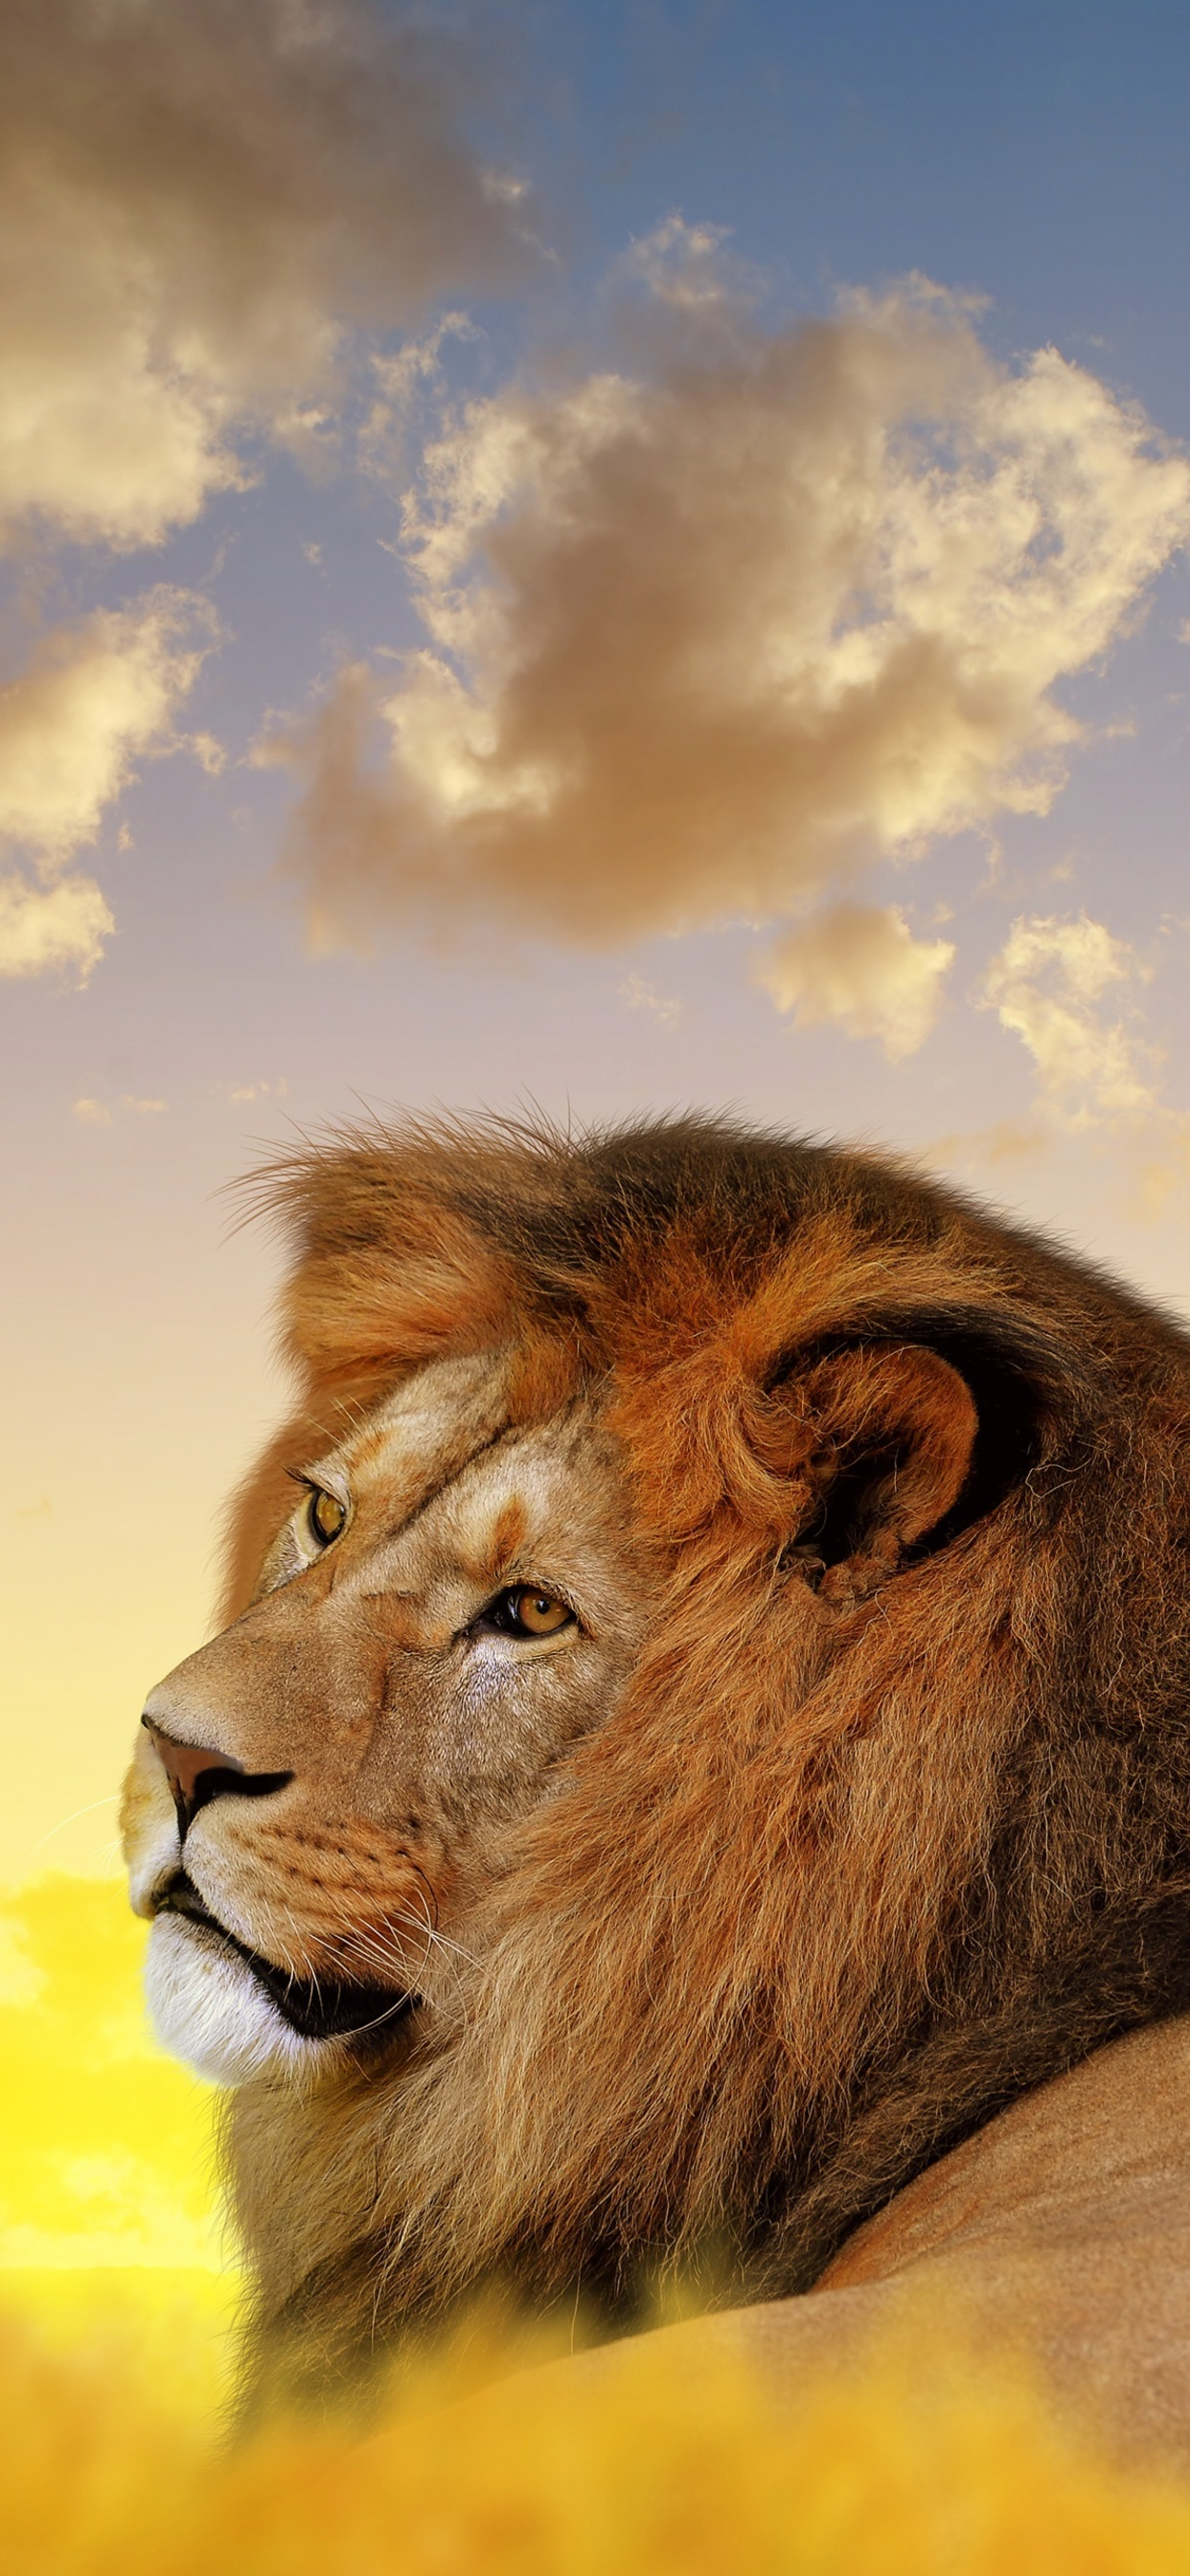 1242x2688 Lion Ultra Hd 4k Iphone Xs Max Hd 4k Wallpapers